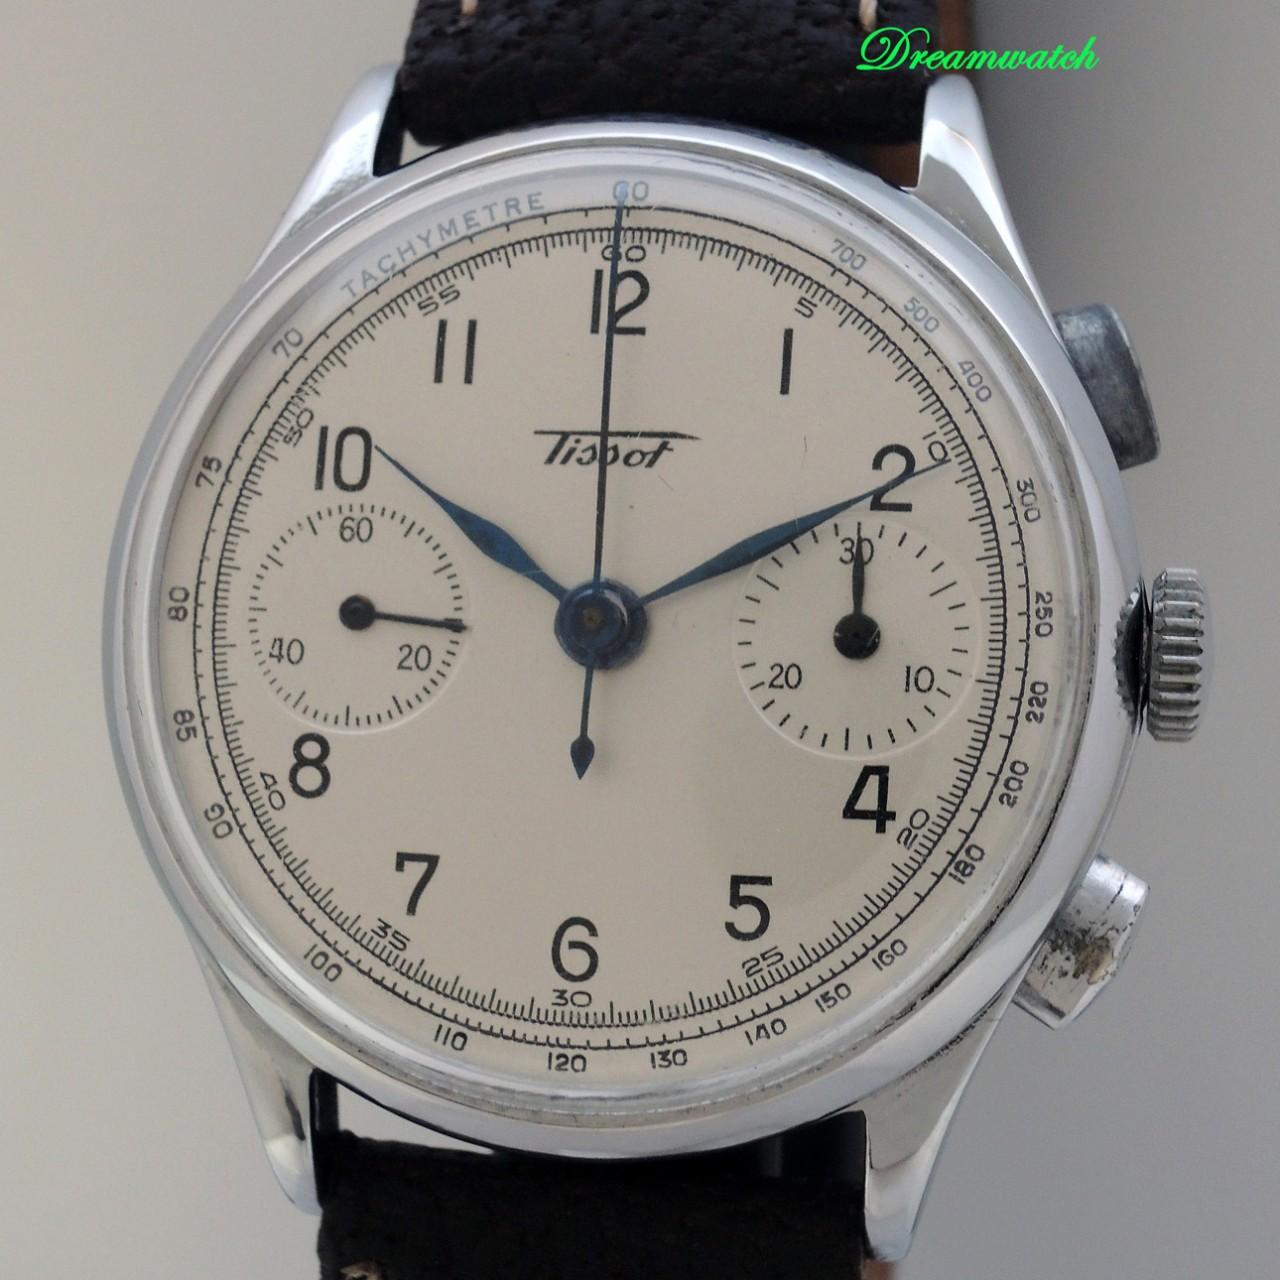 Tissot Chronograph Vintage - Cal. 15TL